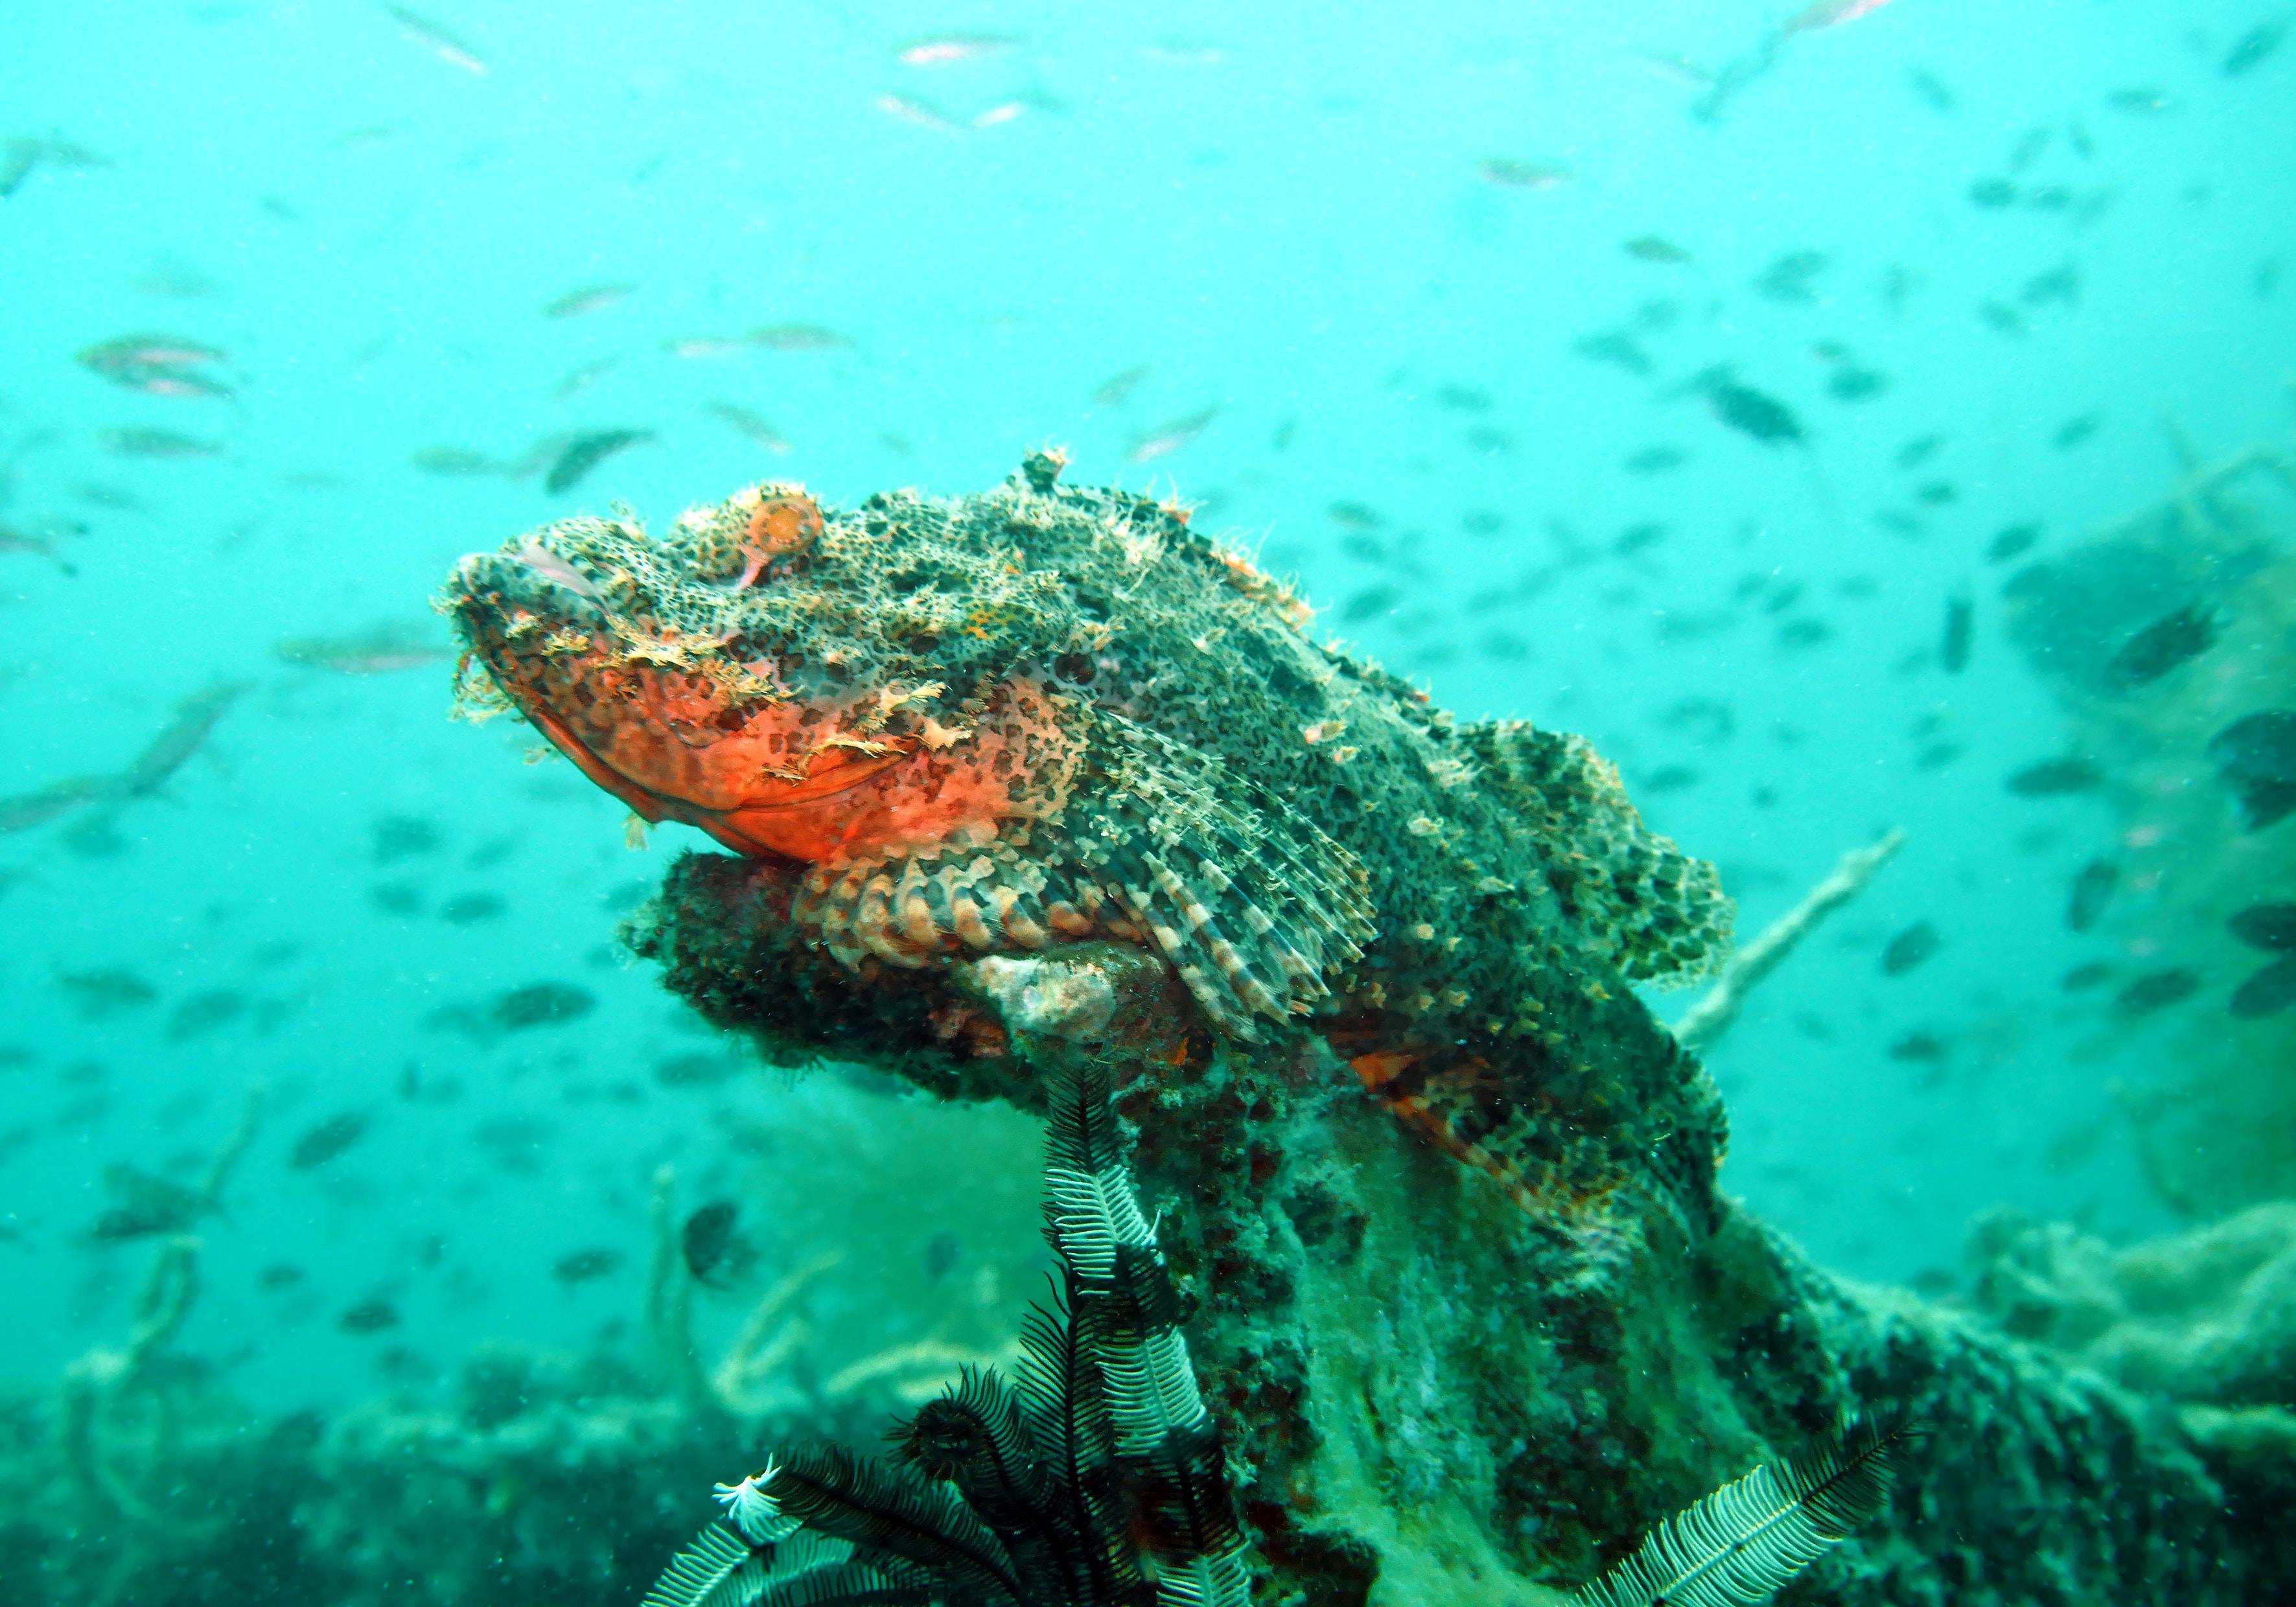 underwater photography of gray and orange fish